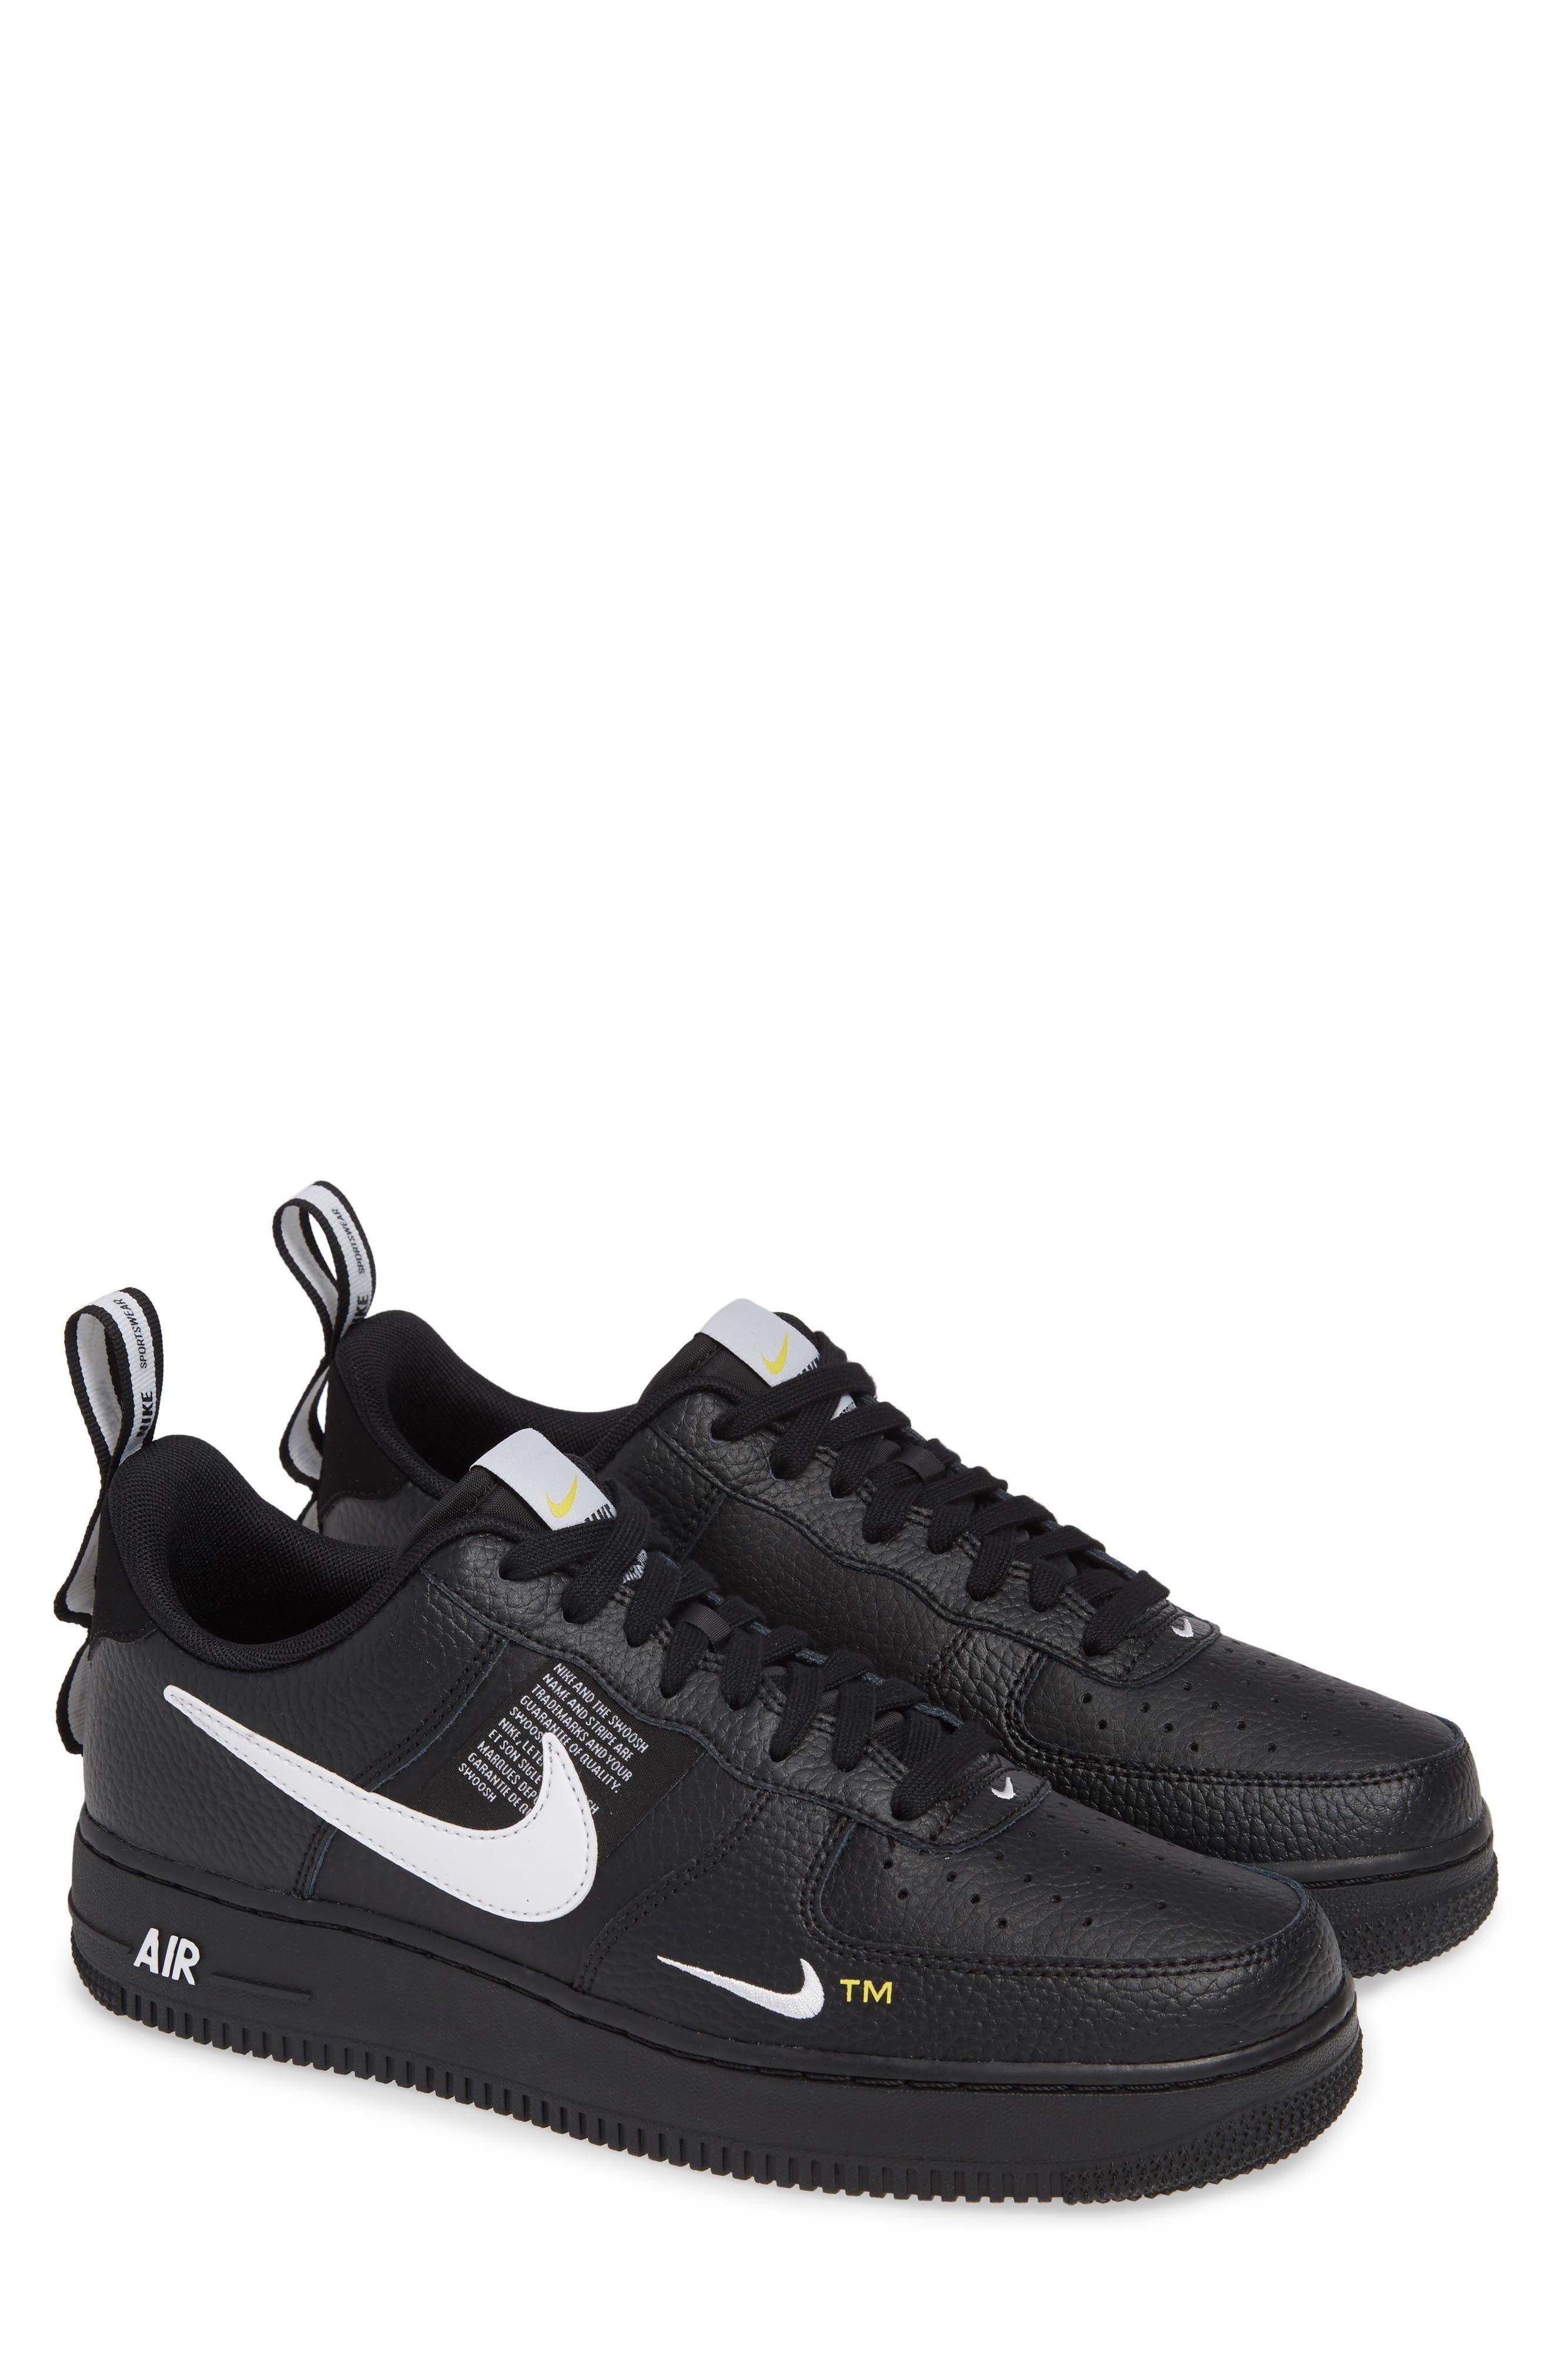 Air Force 1 '07 LV8 Utility Sneaker,                             Alternate thumbnail 2, color,                             BLACK/ WHITE/ TOUR YELLOW